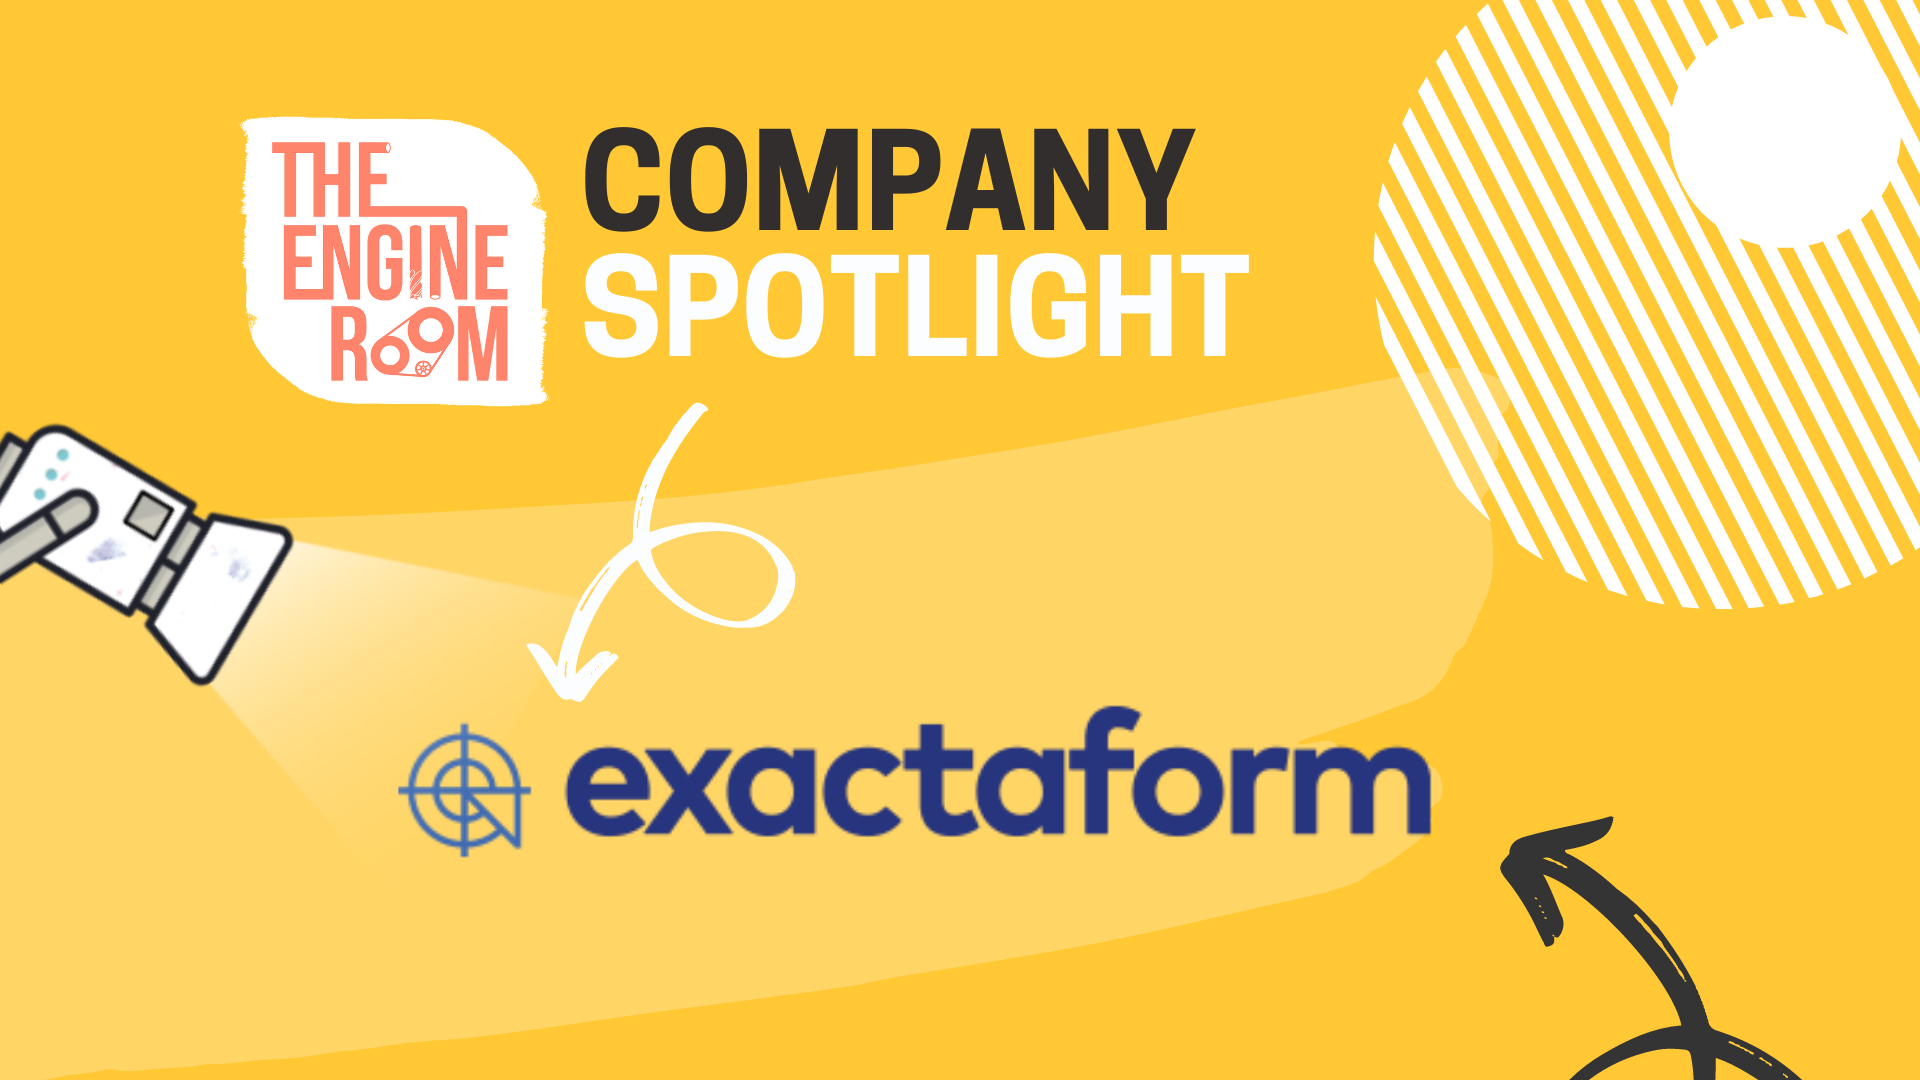 THE ENGINE ROOM - Company Spotlight - Dean Townsend Exactaform